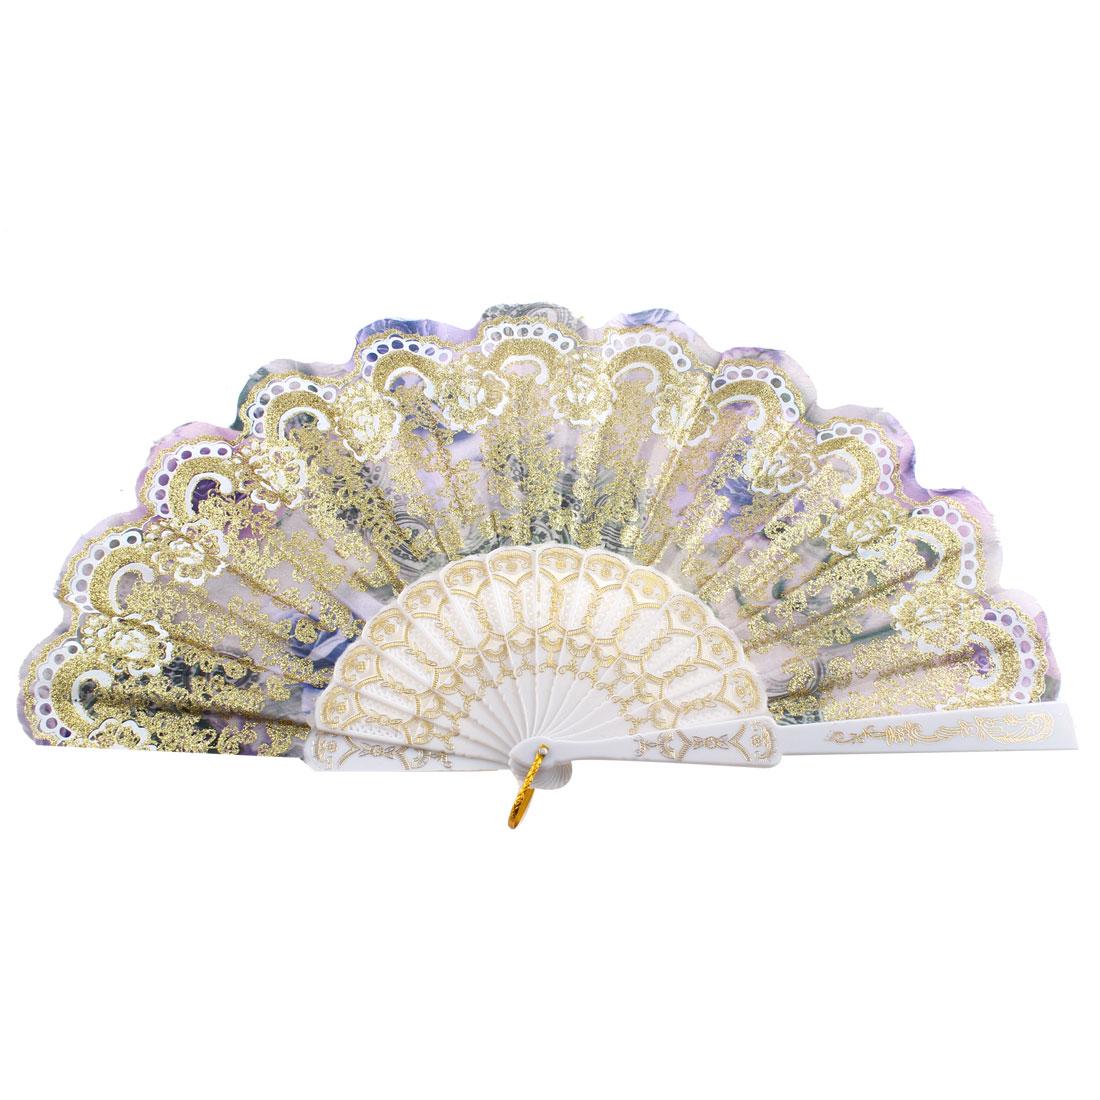 Women Plastic Ribs Glittery Powder Adorn Wedding Gift Folded Hand Fan Gold Tone